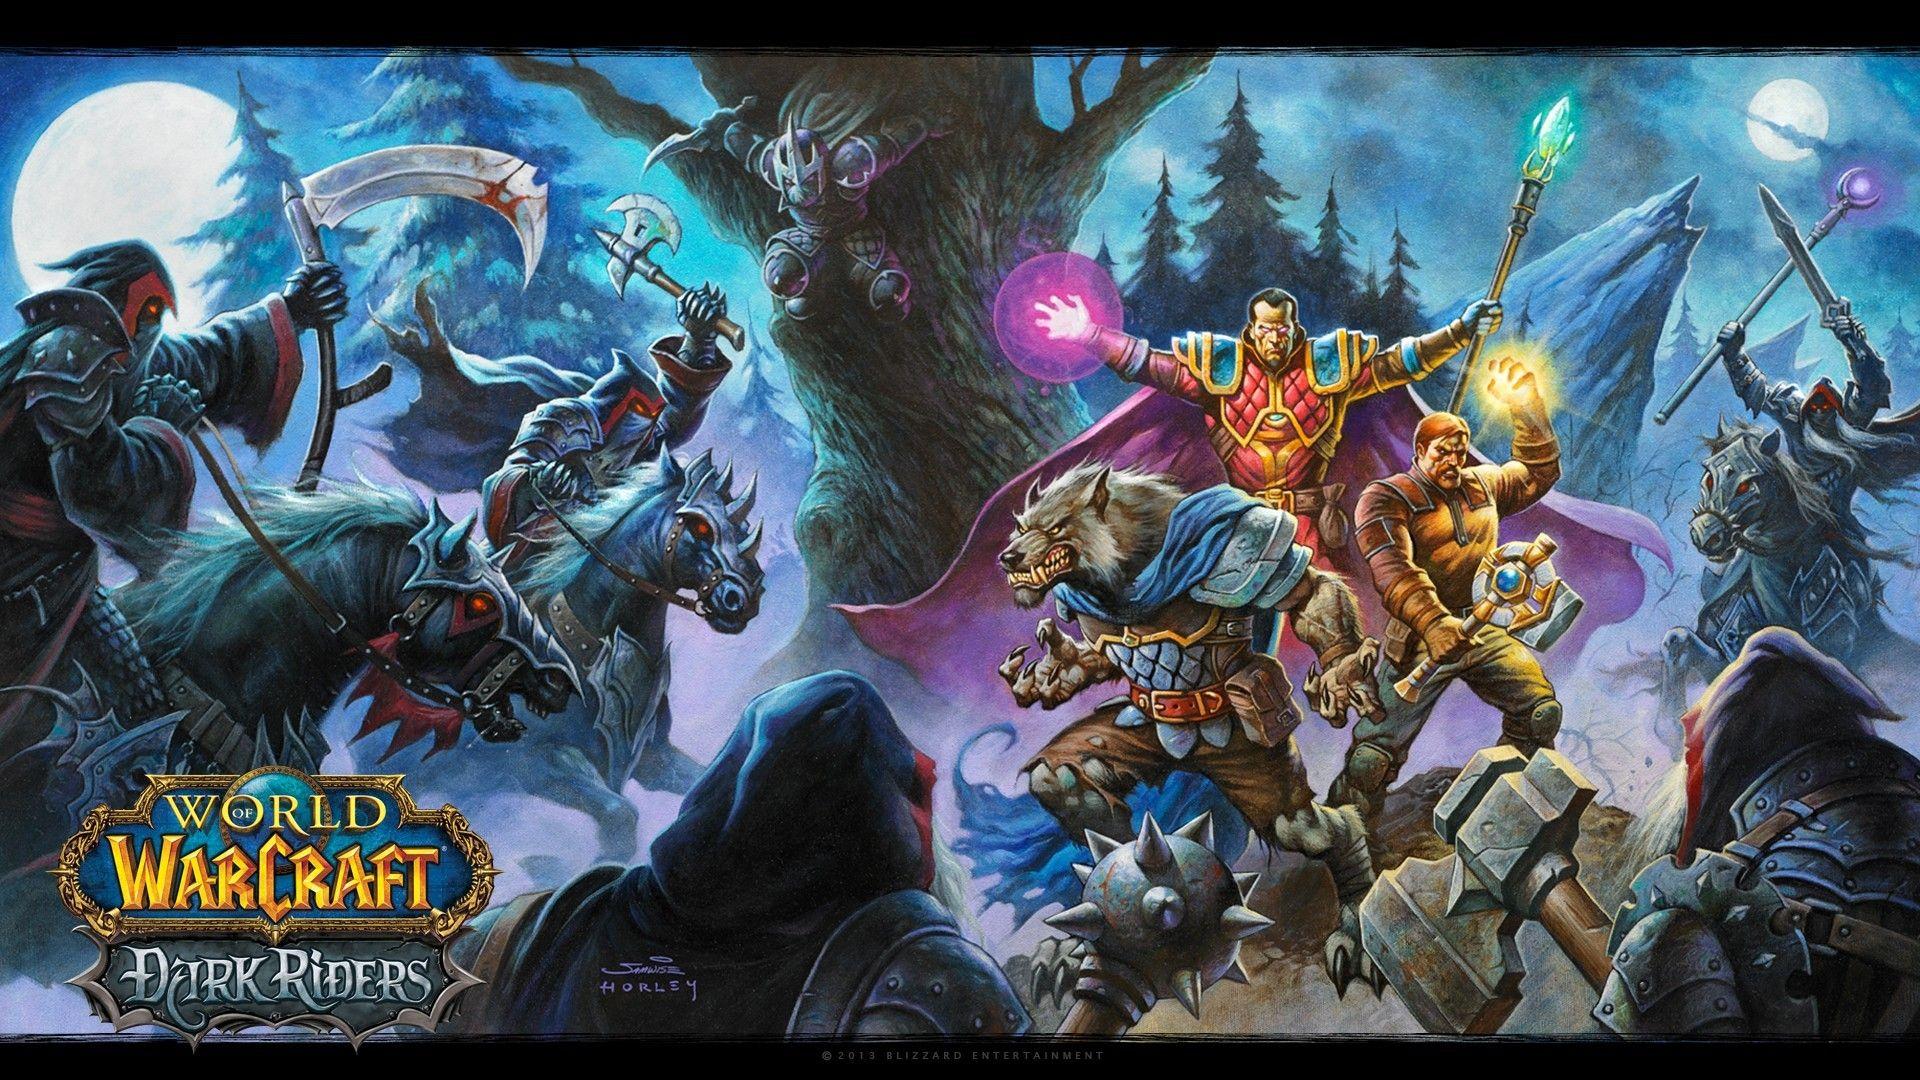 Blizzard Entertainment wallpapers or desktop backgrounds